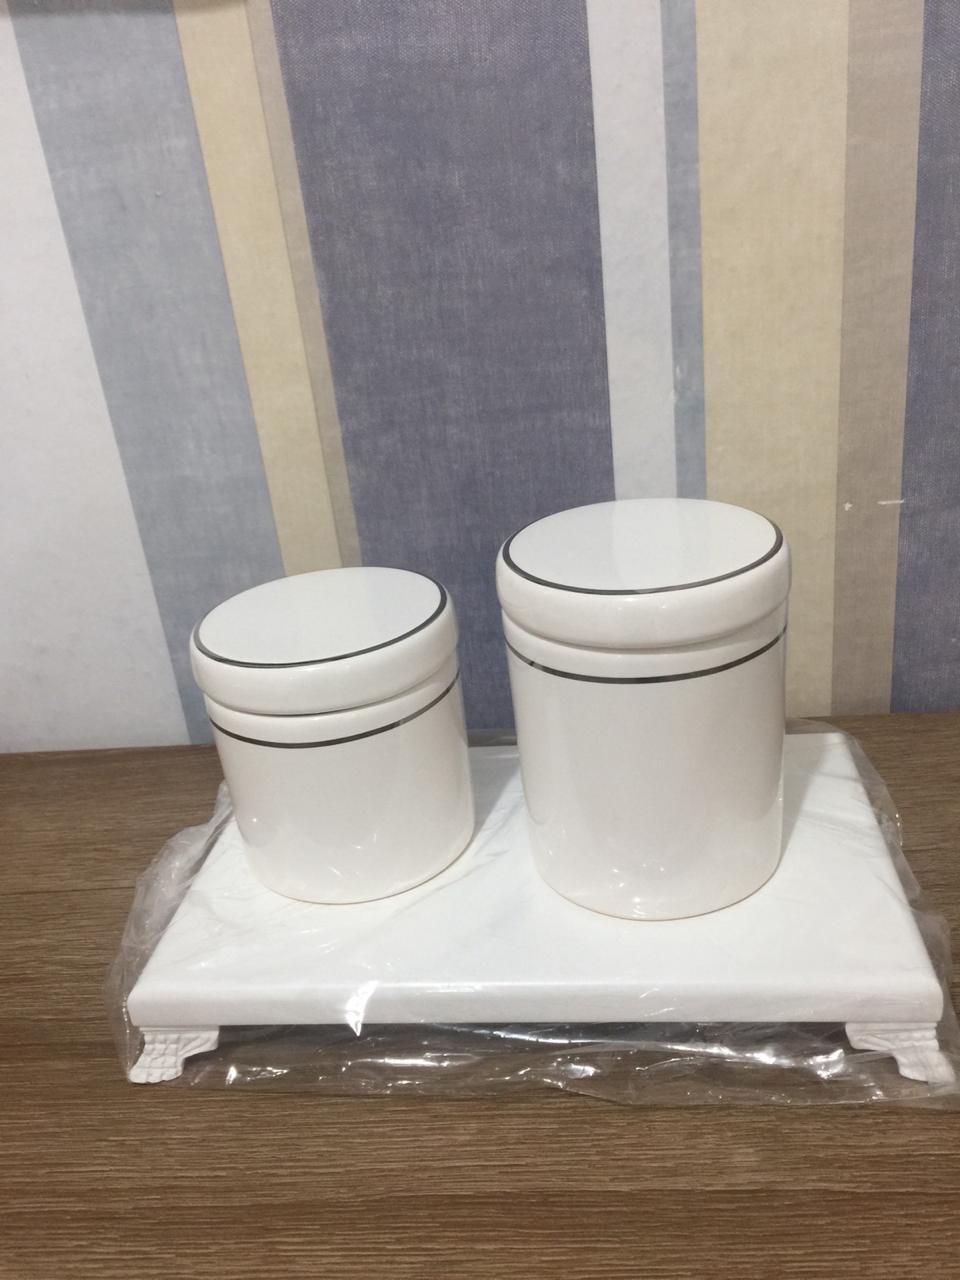 Kit Higiene 3 peças Branco com Friso Prata